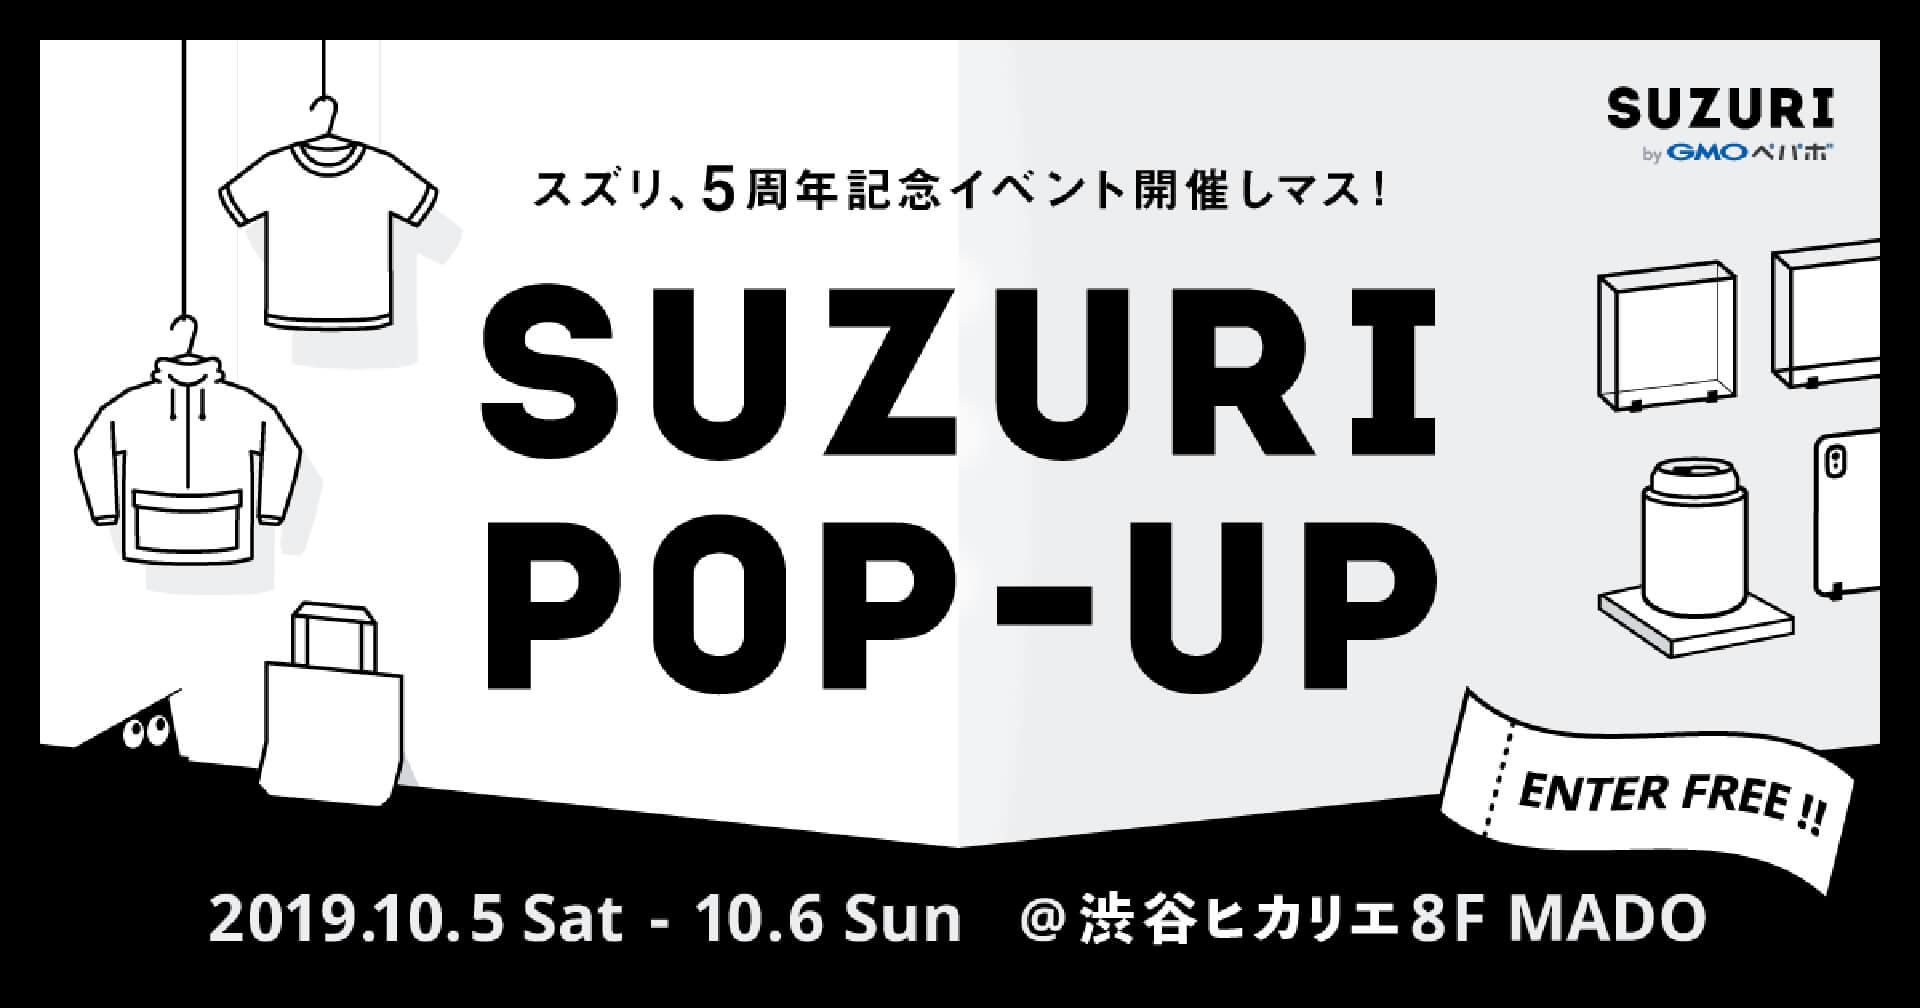 SUZURI POP-UPメインビジュアル